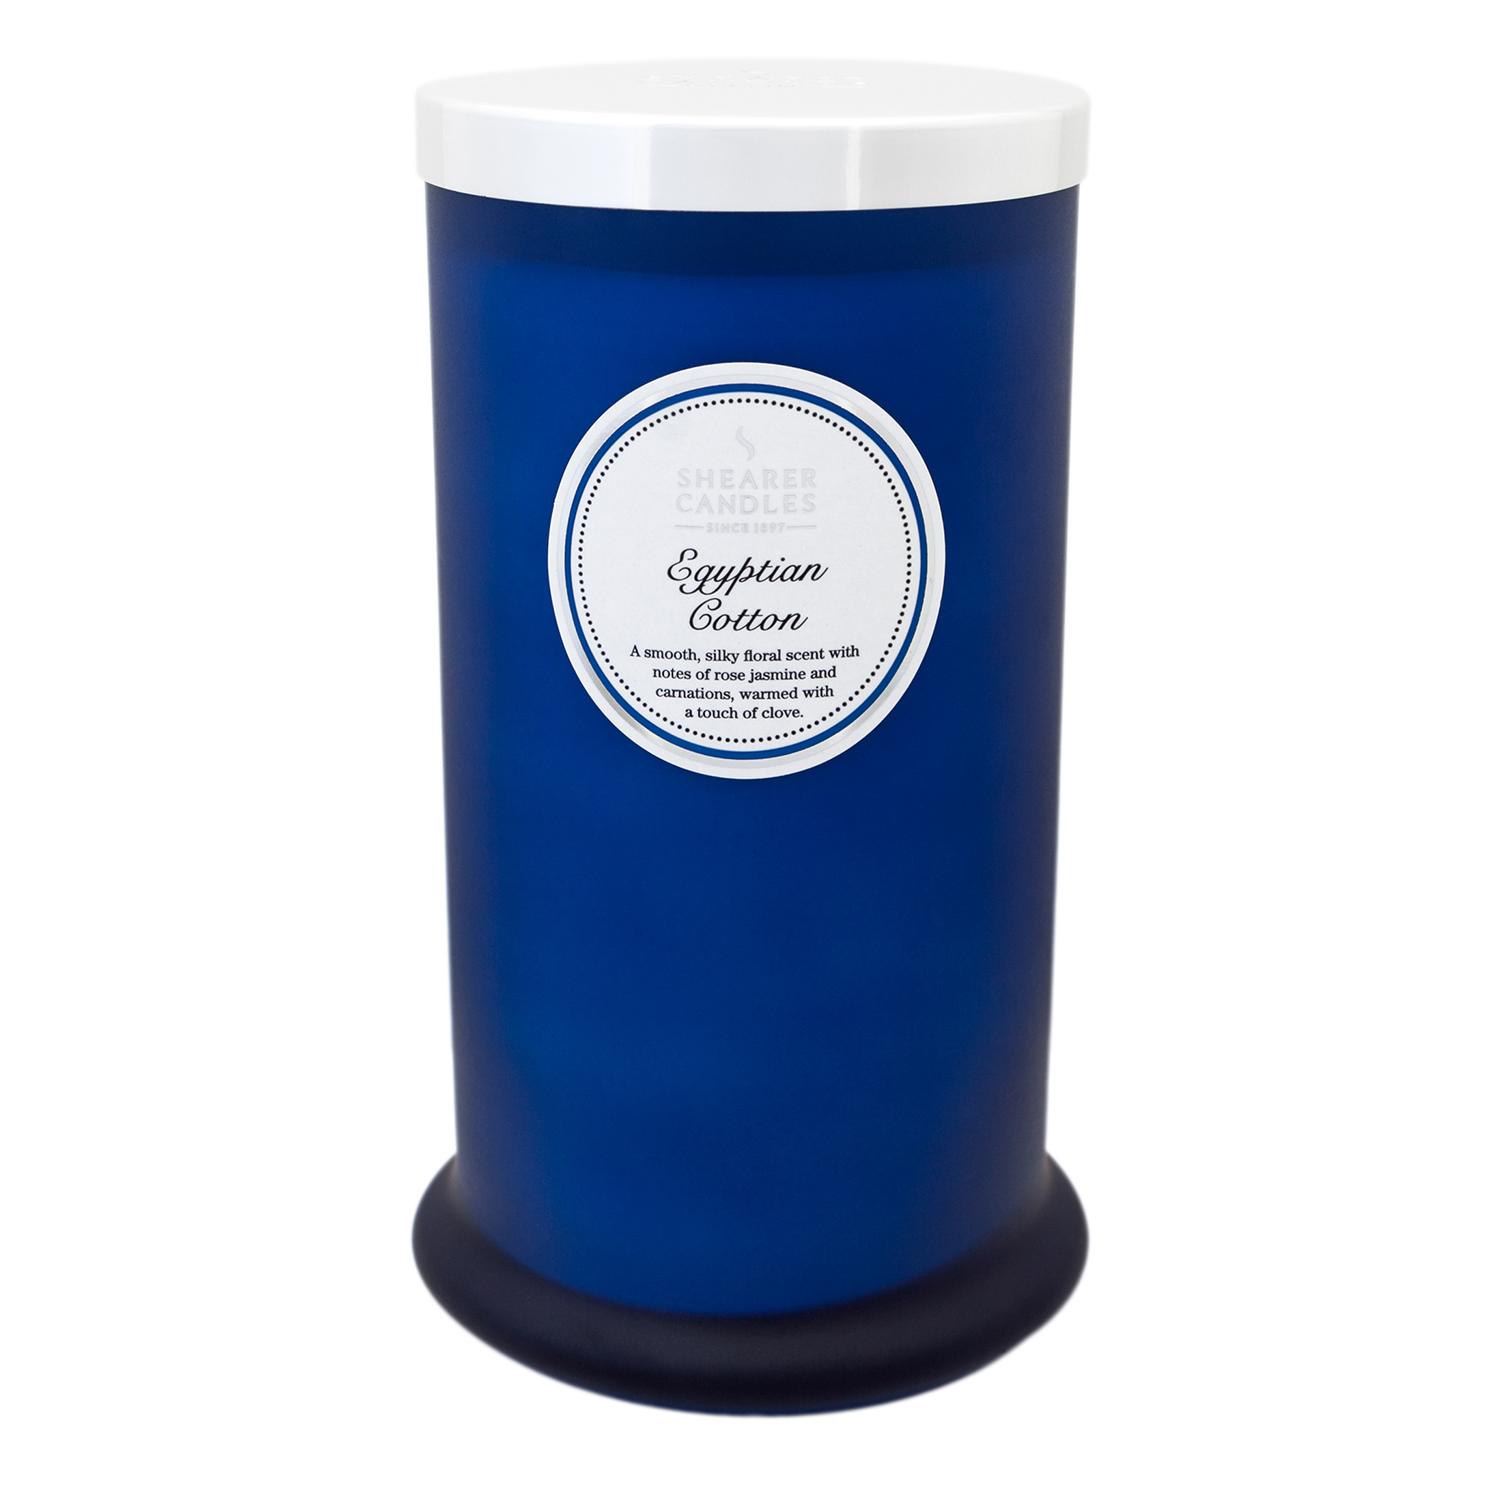 Shearer Candles – Egyptian Cotton Tall Pillar Jar Candle